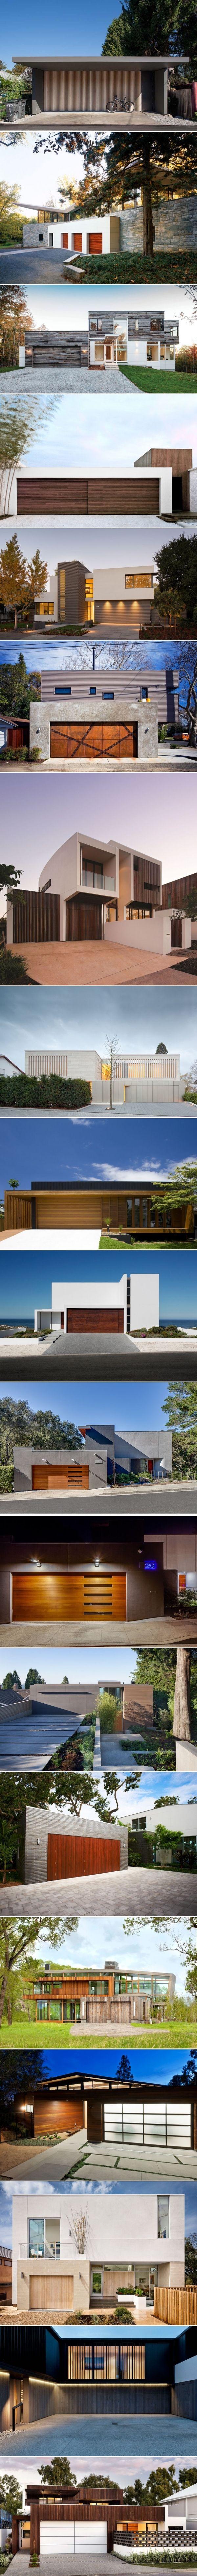 18 Inspirational Examples of Modern Garage Doors   CONTEMPORIST